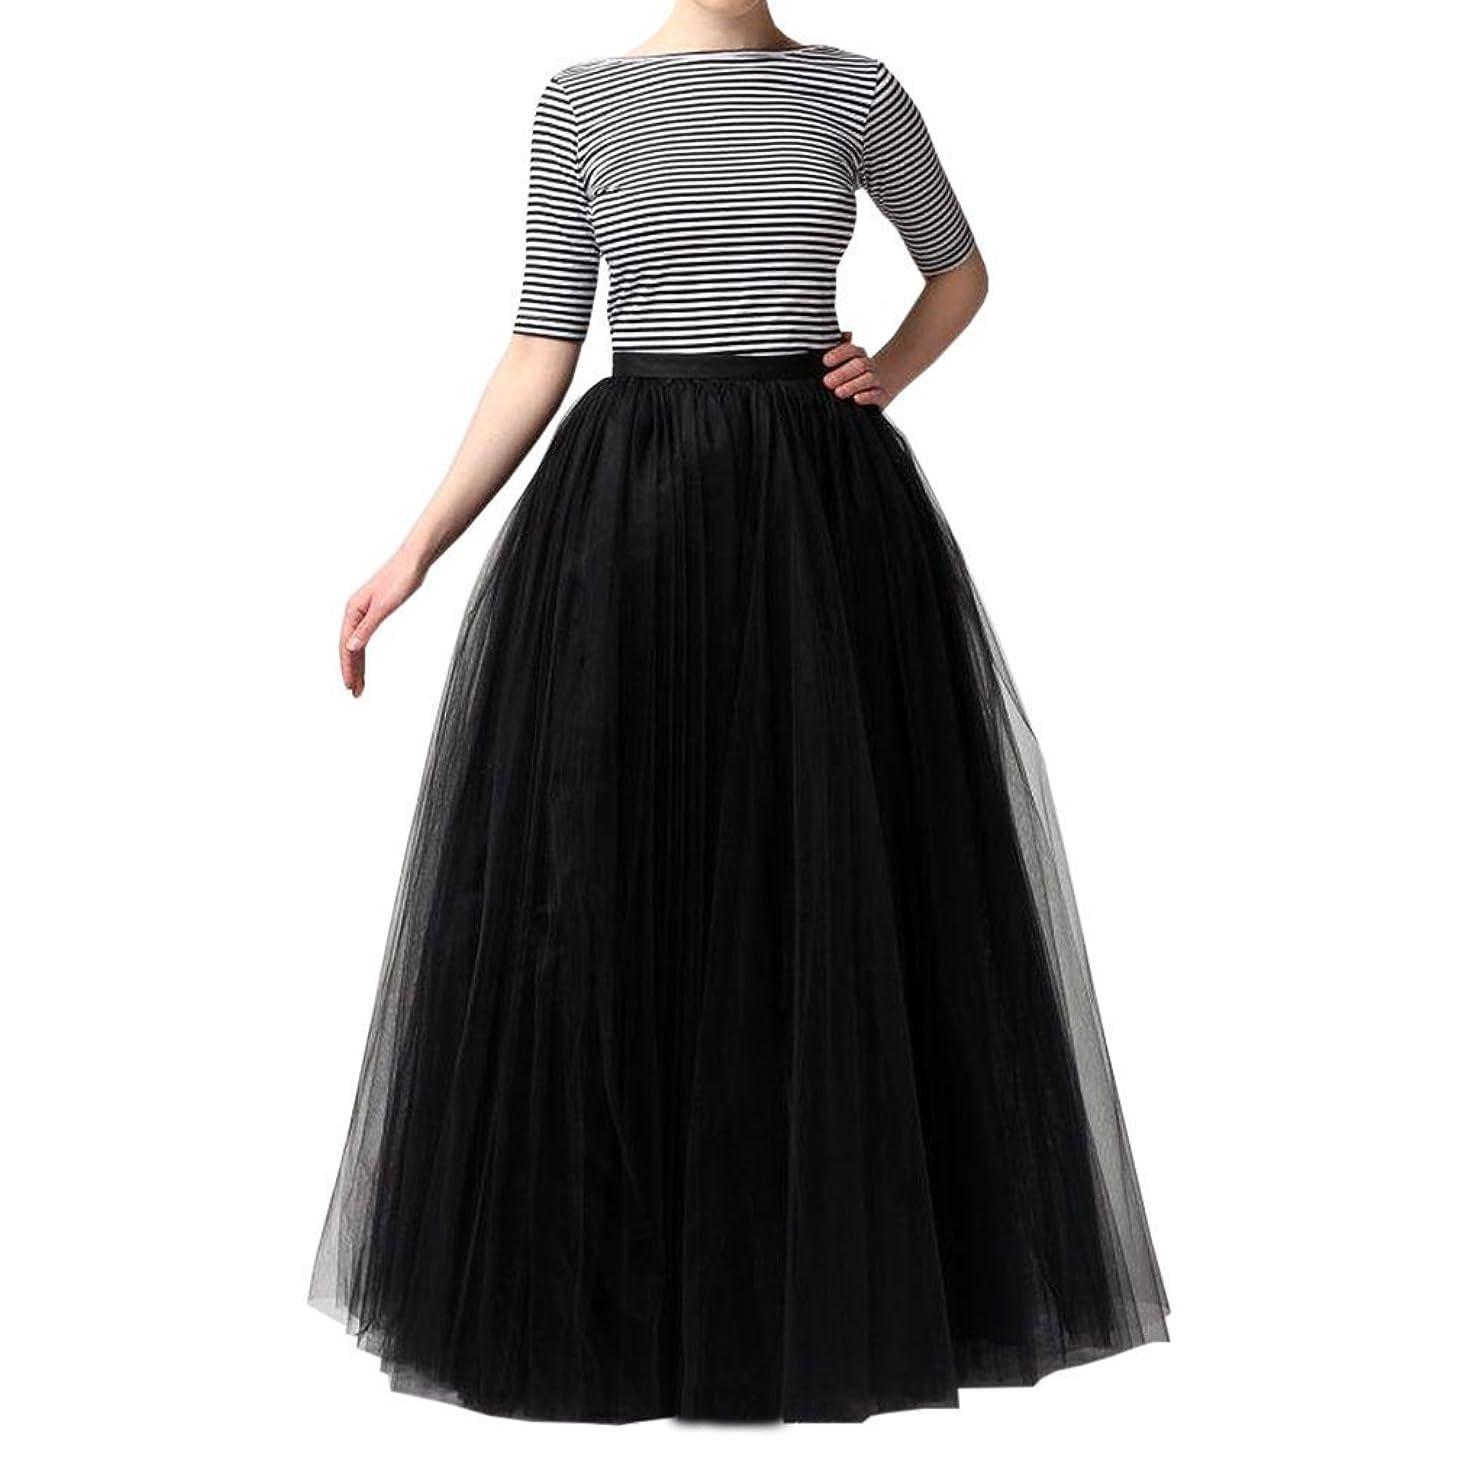 8334a04de638e9 Wedding Planning Women's Black Tulle Special Occasion Skirt; WDPL Women's  Long Tutu Tulle Skirt A Line Floor Length Skirts